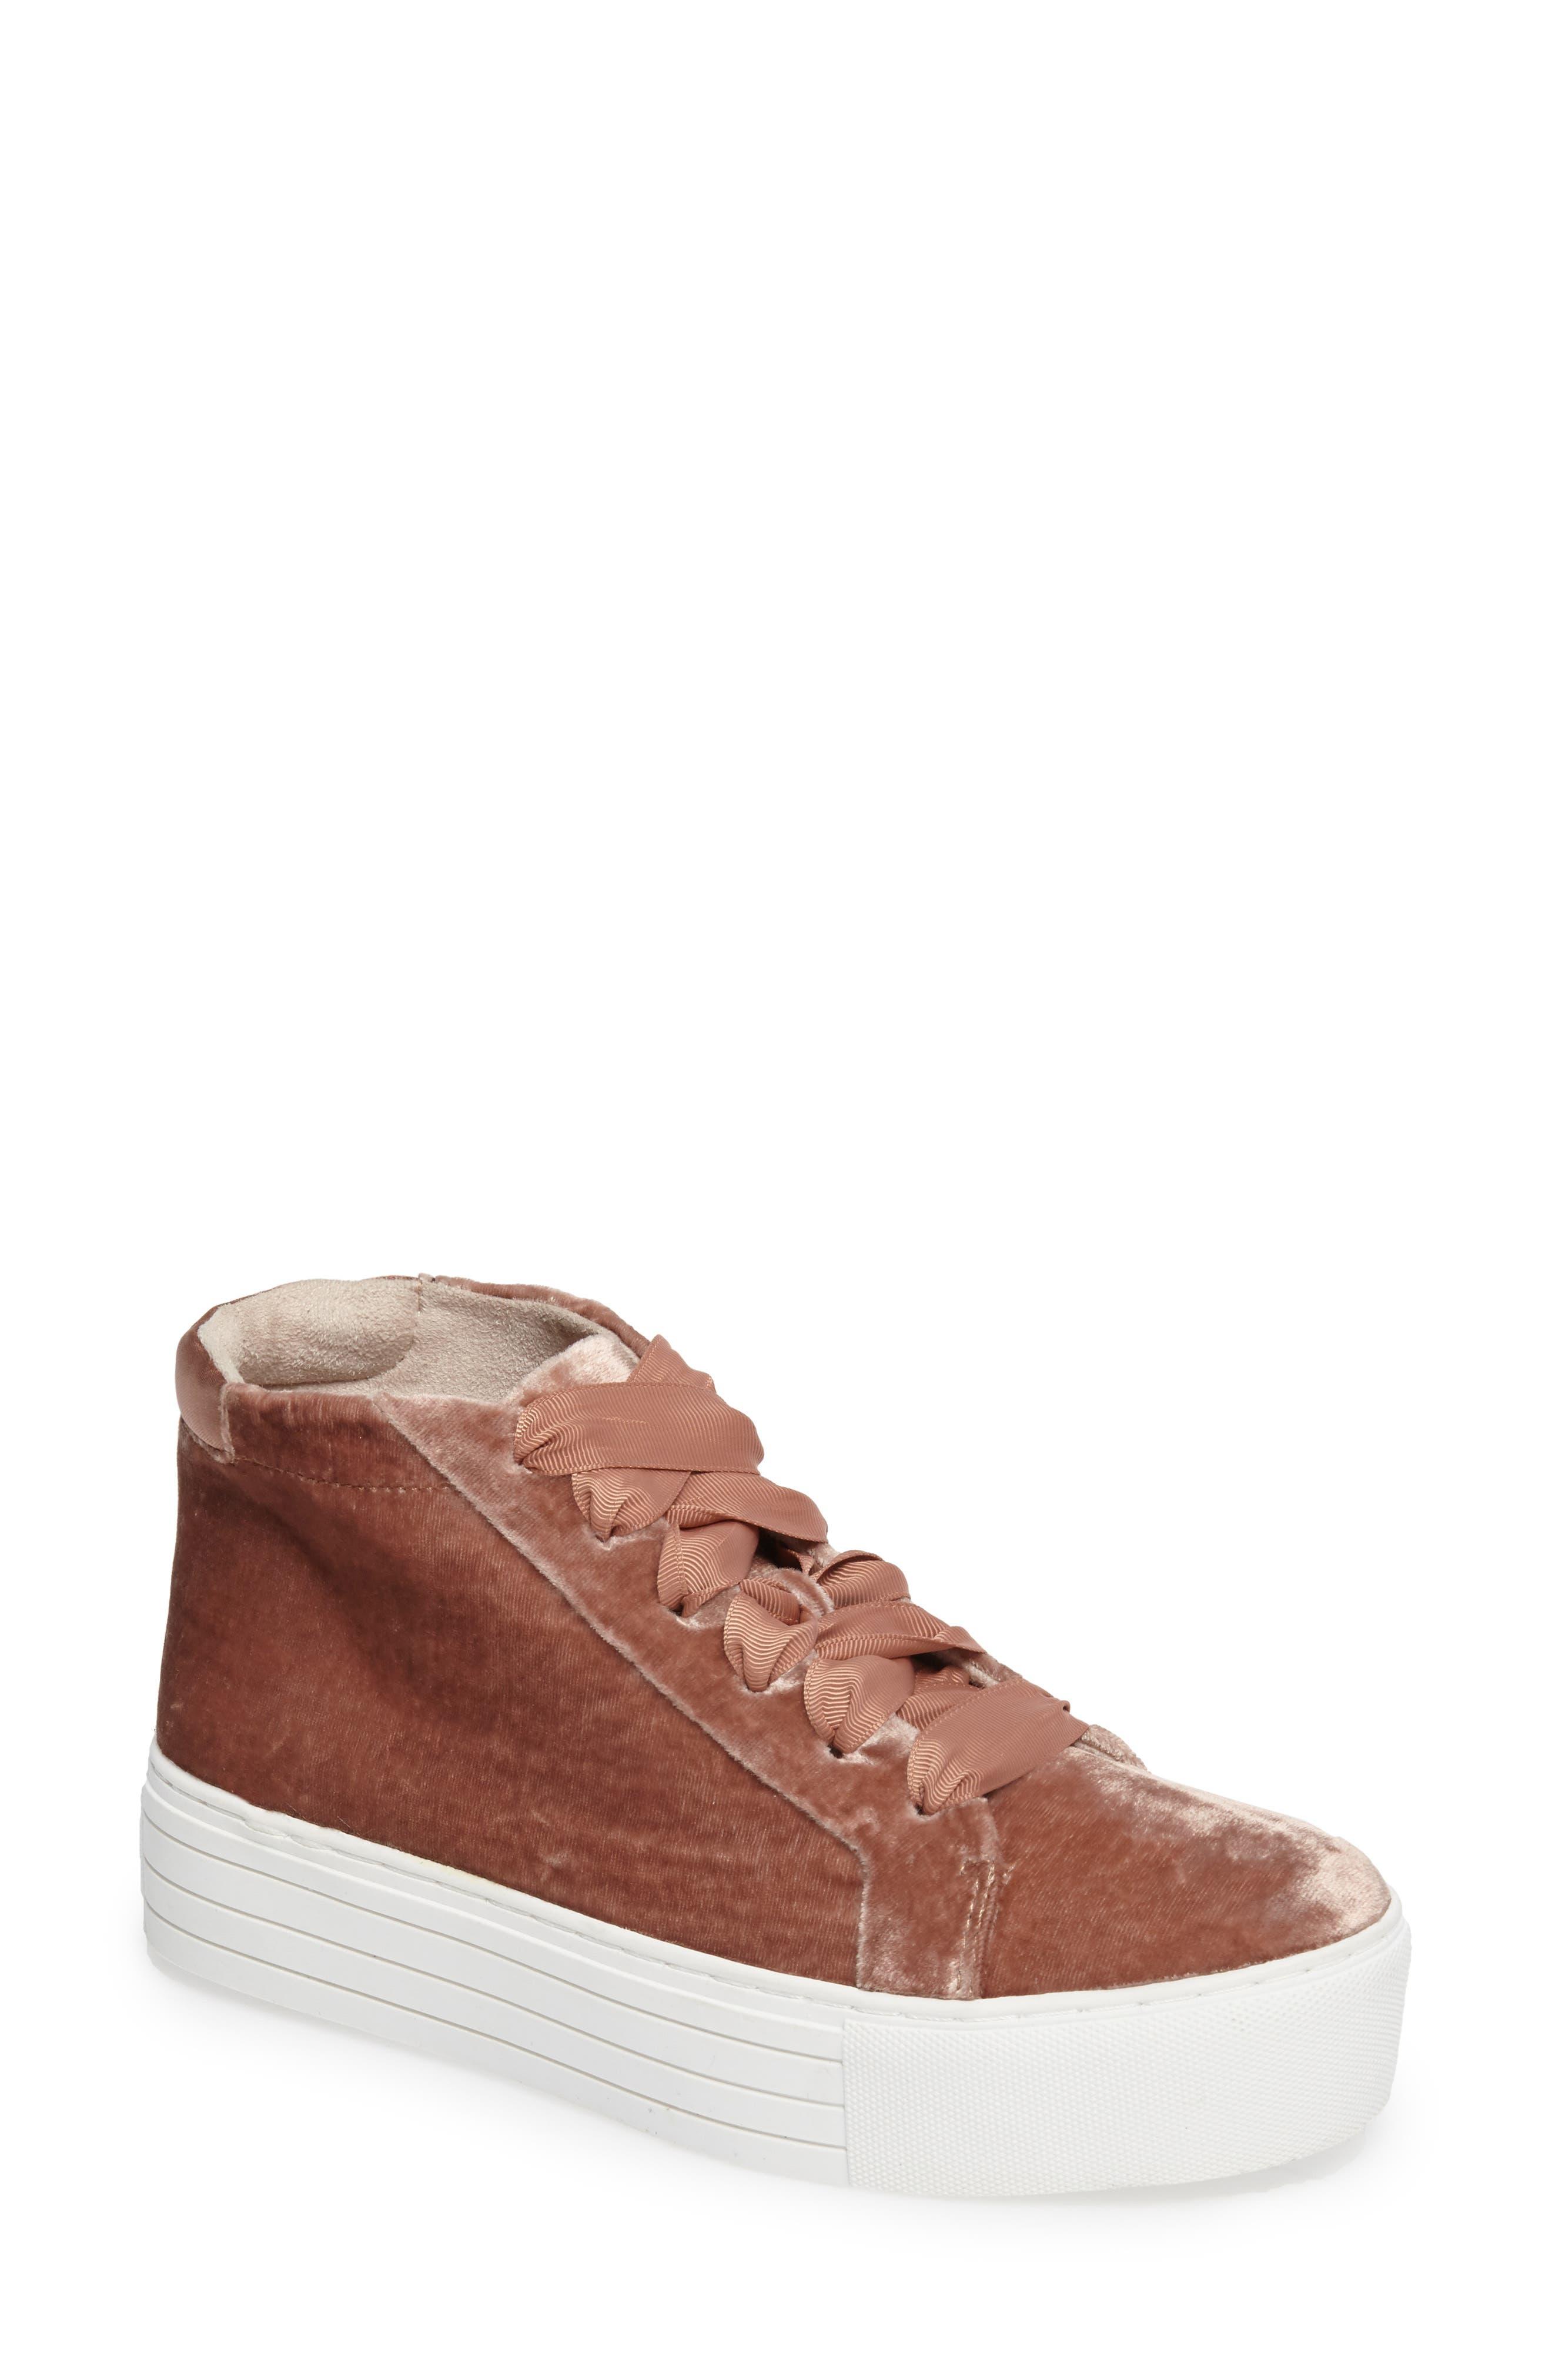 Kenneth Cole New York Janette High Top Platform Sneaker (Women)